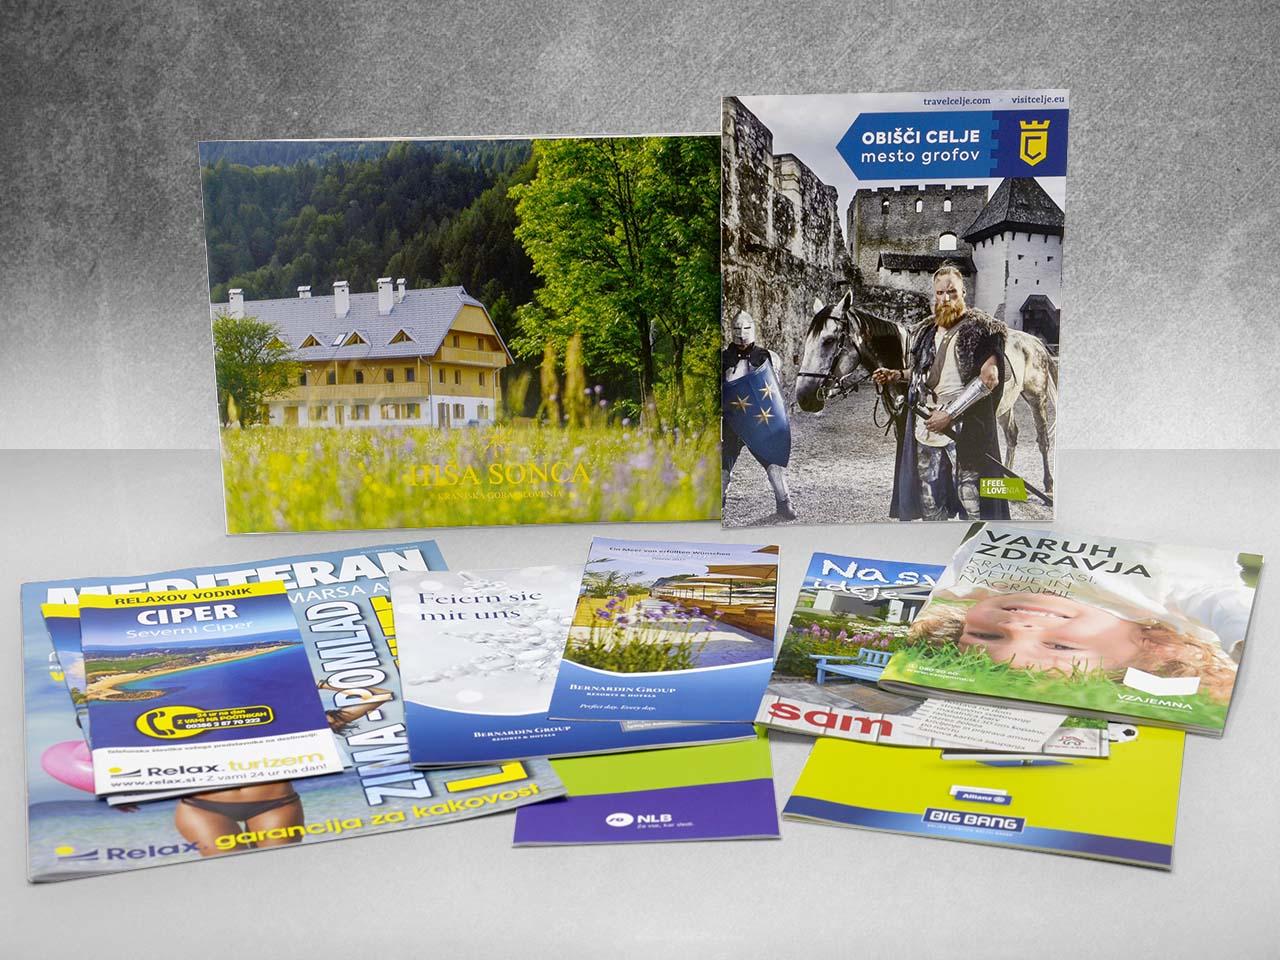 Online catalogues, pamphlets & brochures